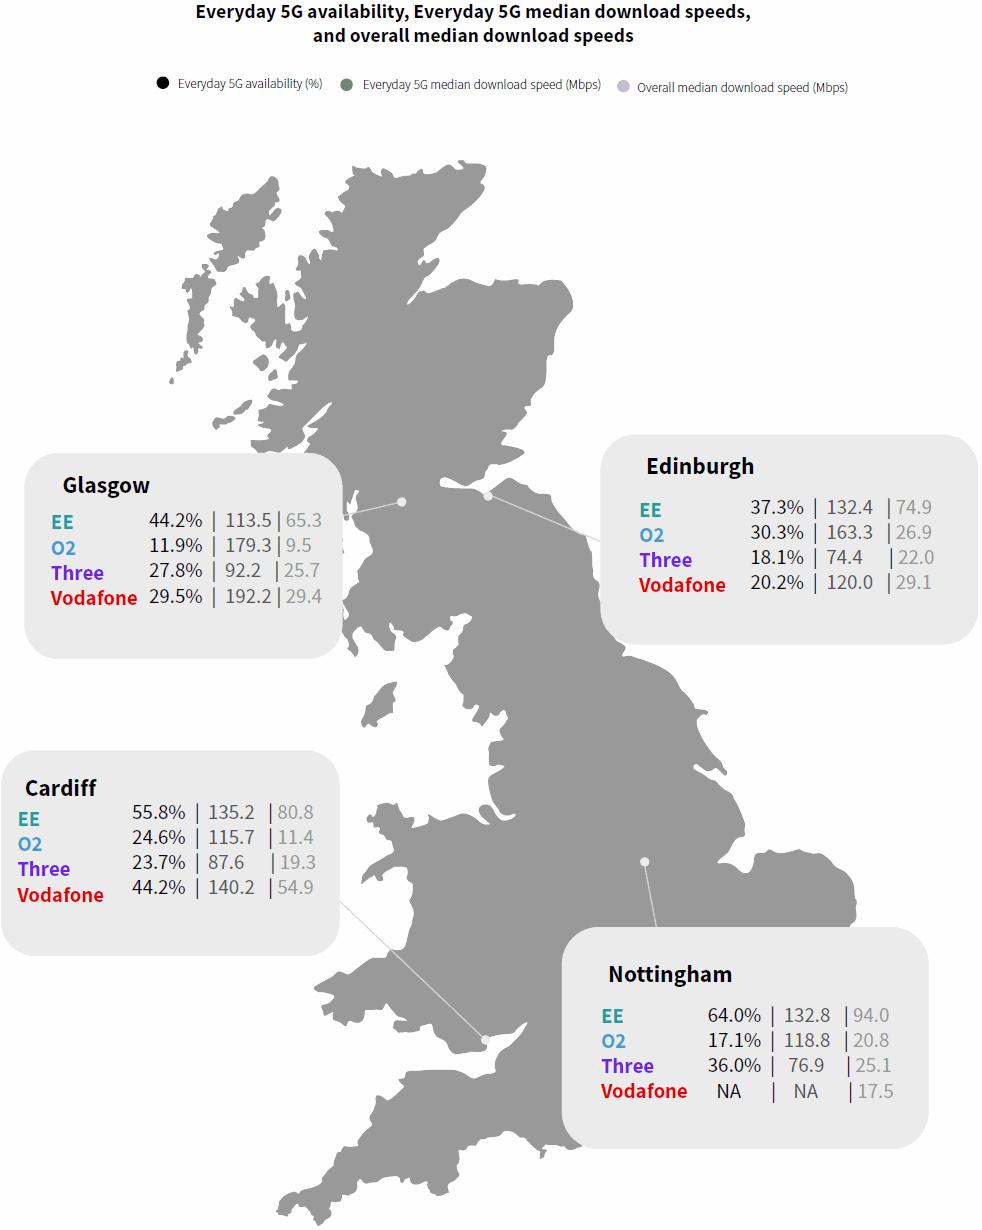 rootmetrics_everyday_5g_speeds_h1_2021-map-Edinburgh-Glasgow-Cardiff-Nottingham